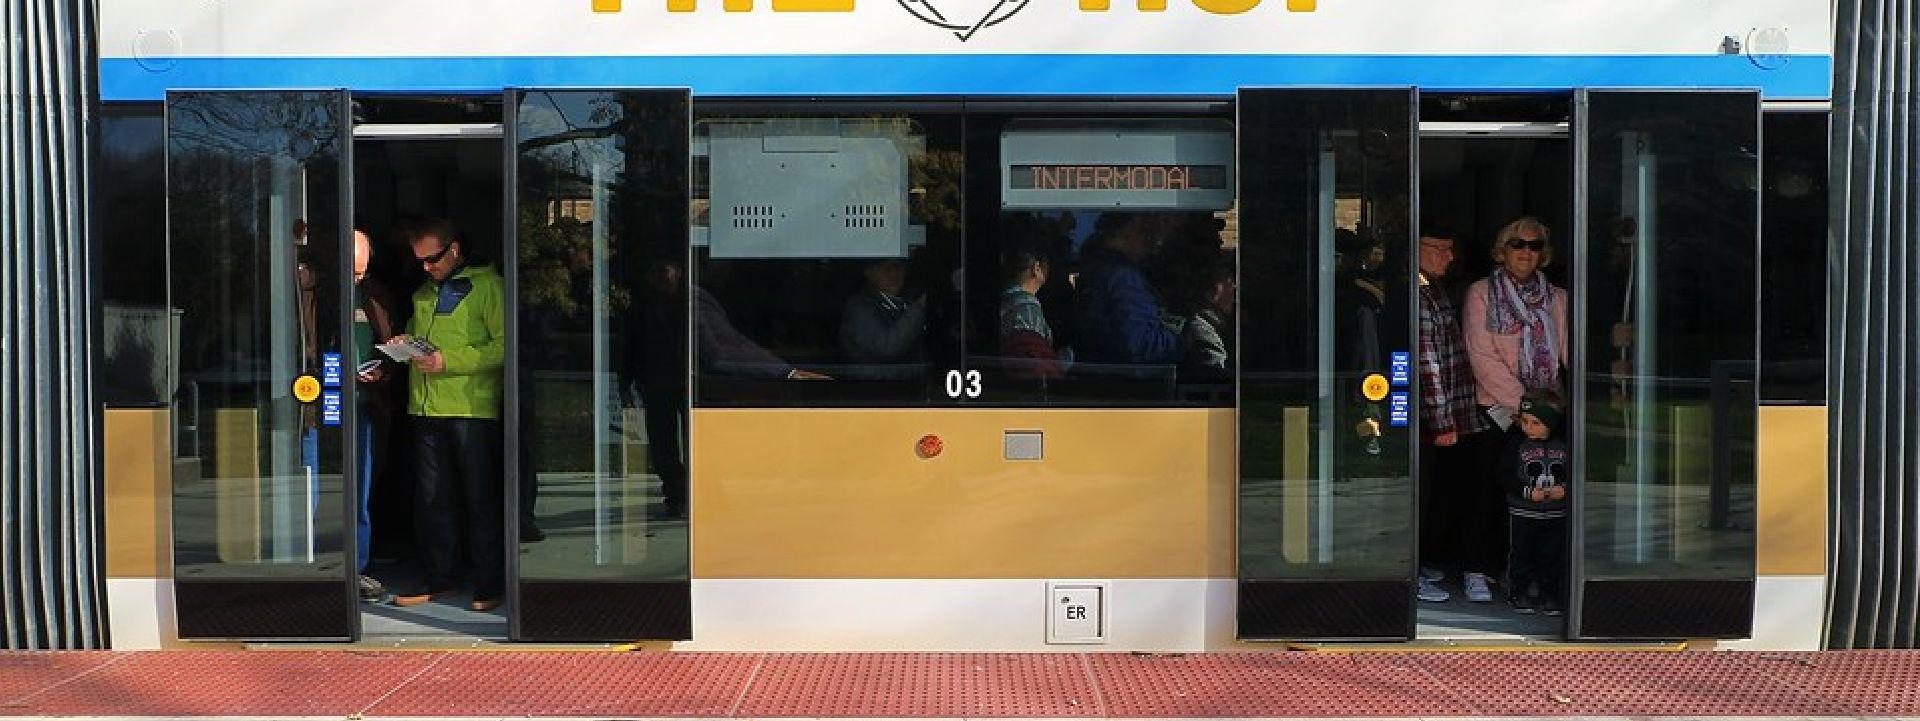 Streetcar with doors opening